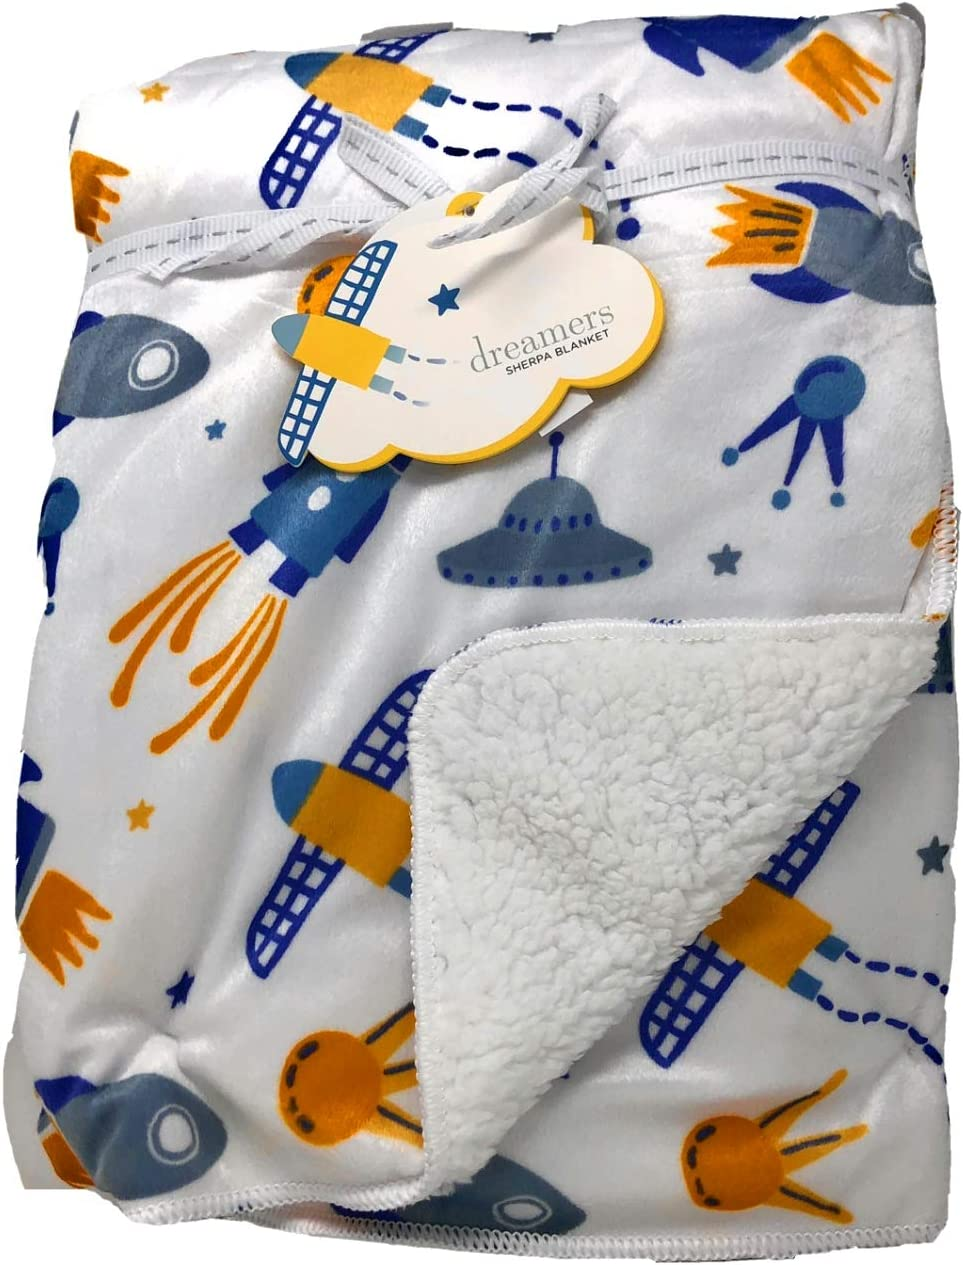 Dreamers Blast Off Space Ships, Rockets, Stars, Asteroids Plush Sherpa Baby Blanket   30W X 40L in